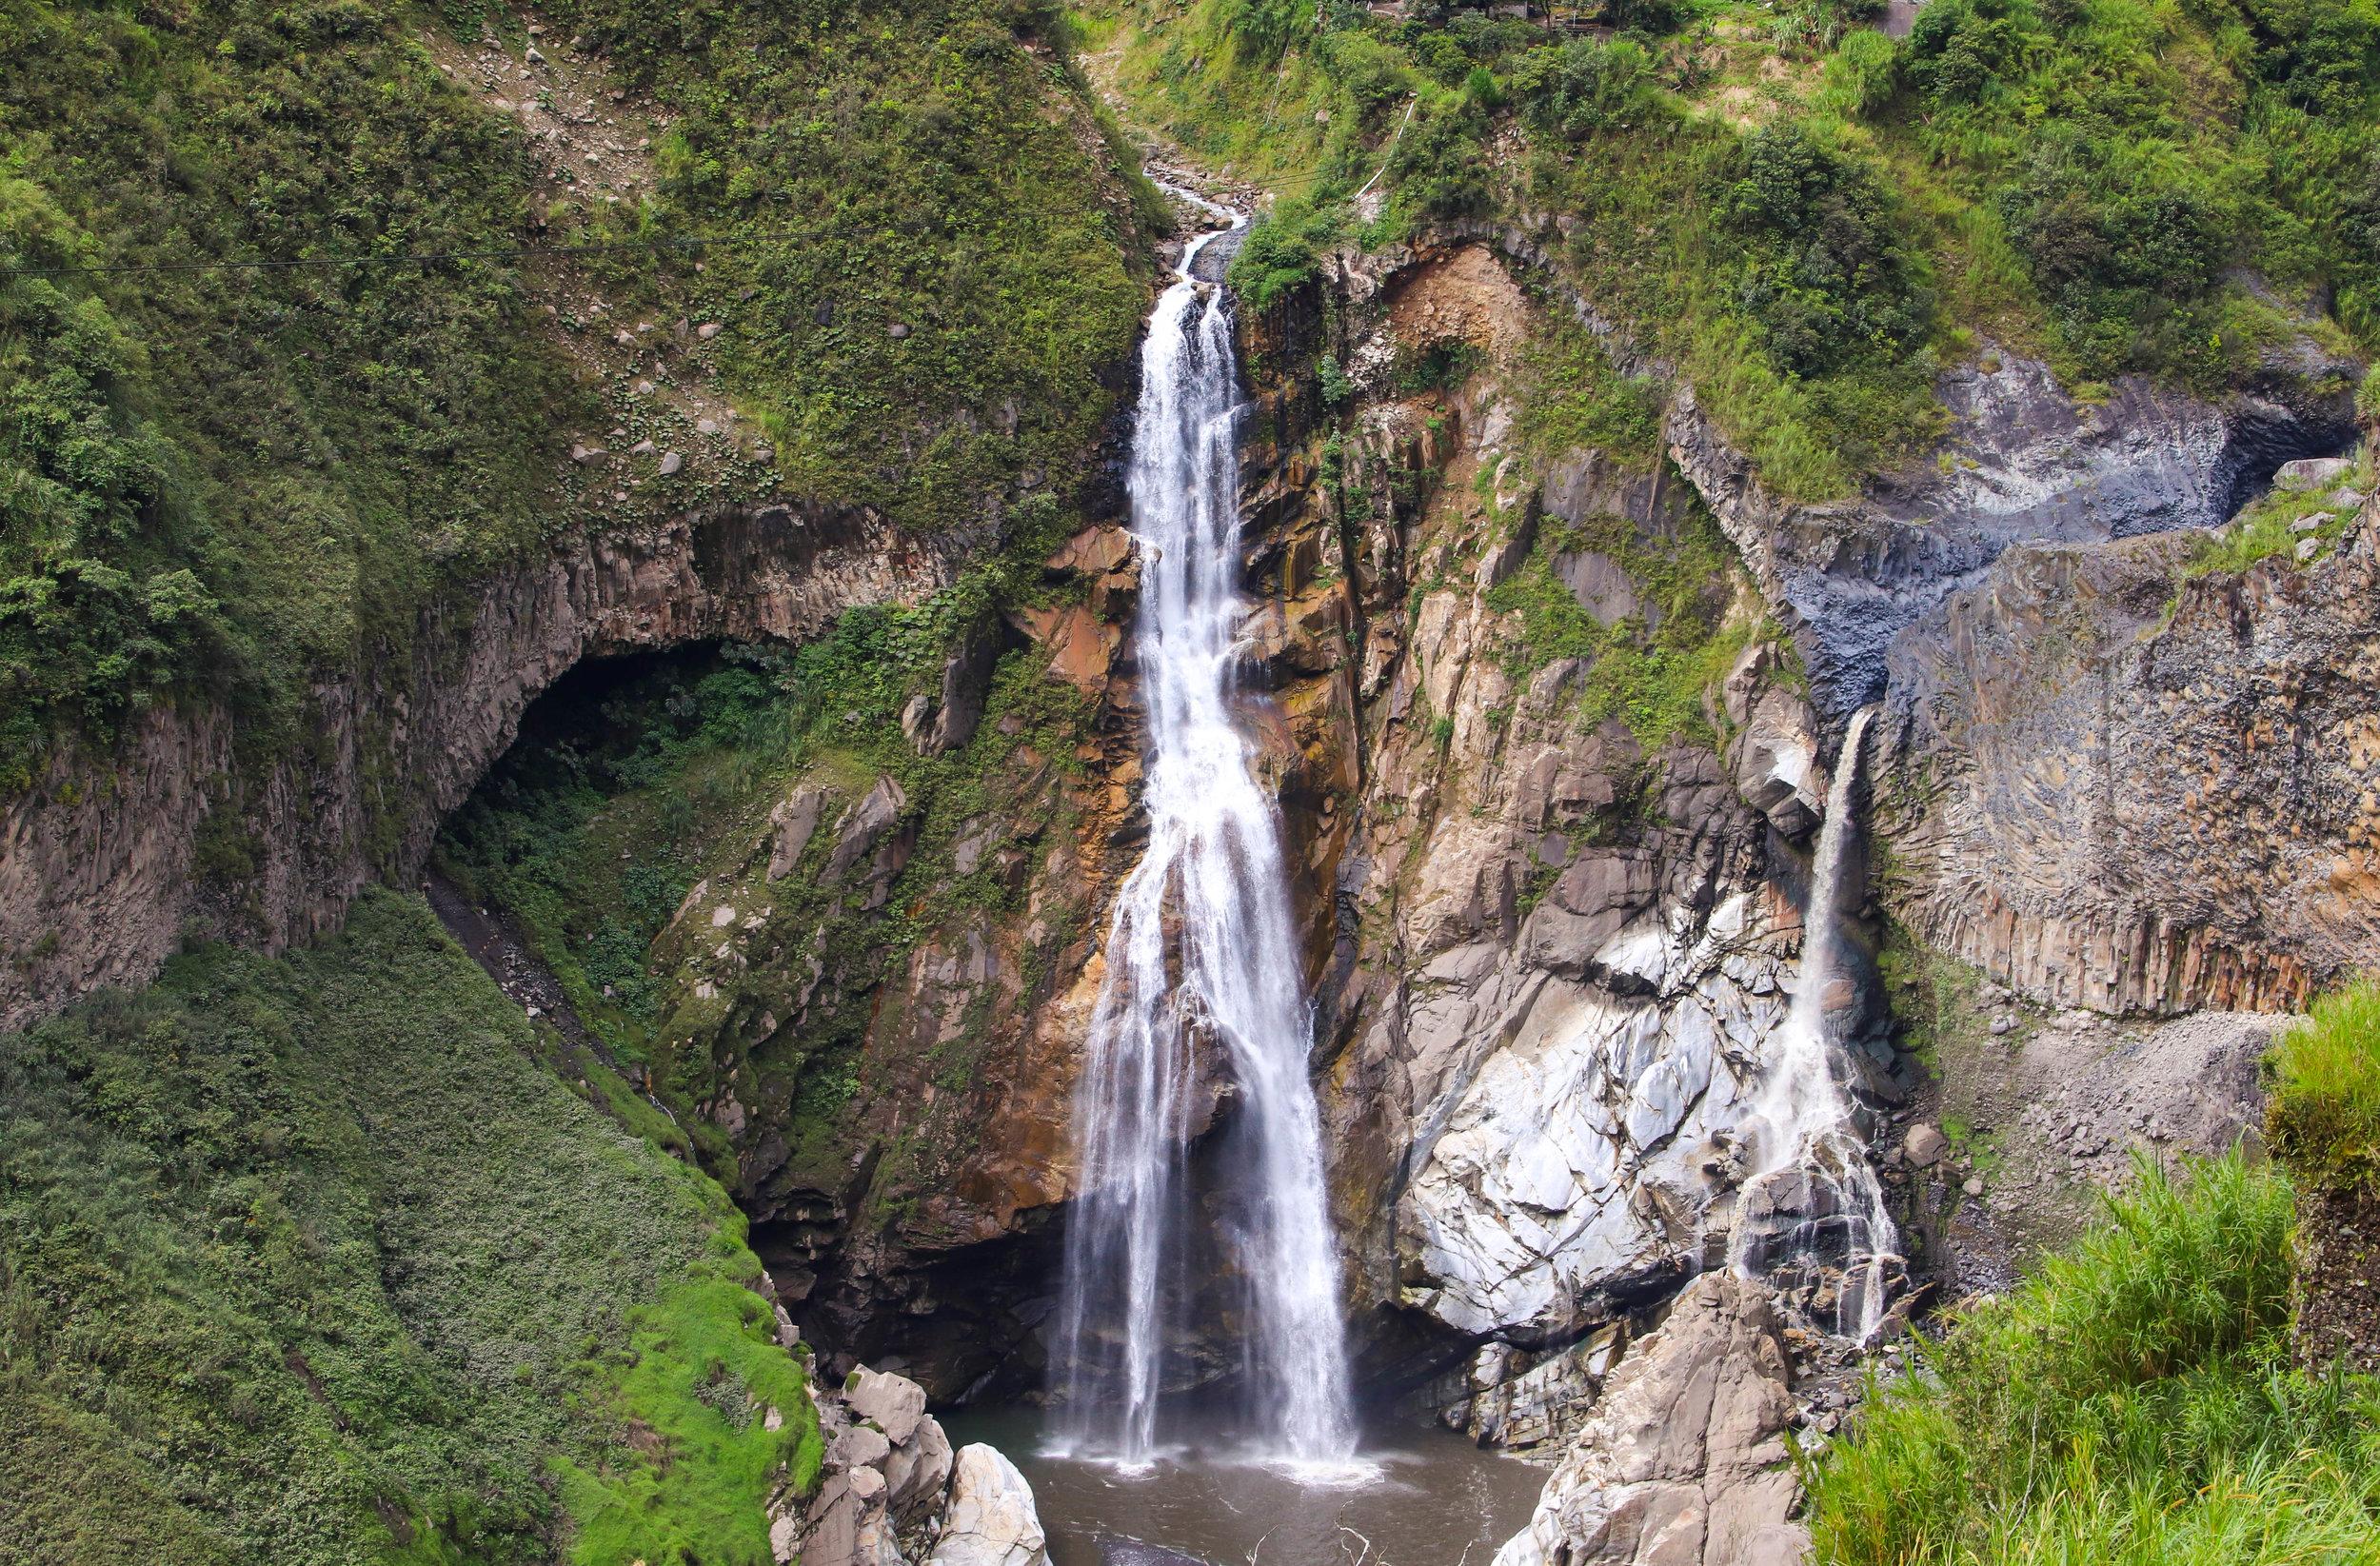 IMG_1487Banos Waterfall.jpg